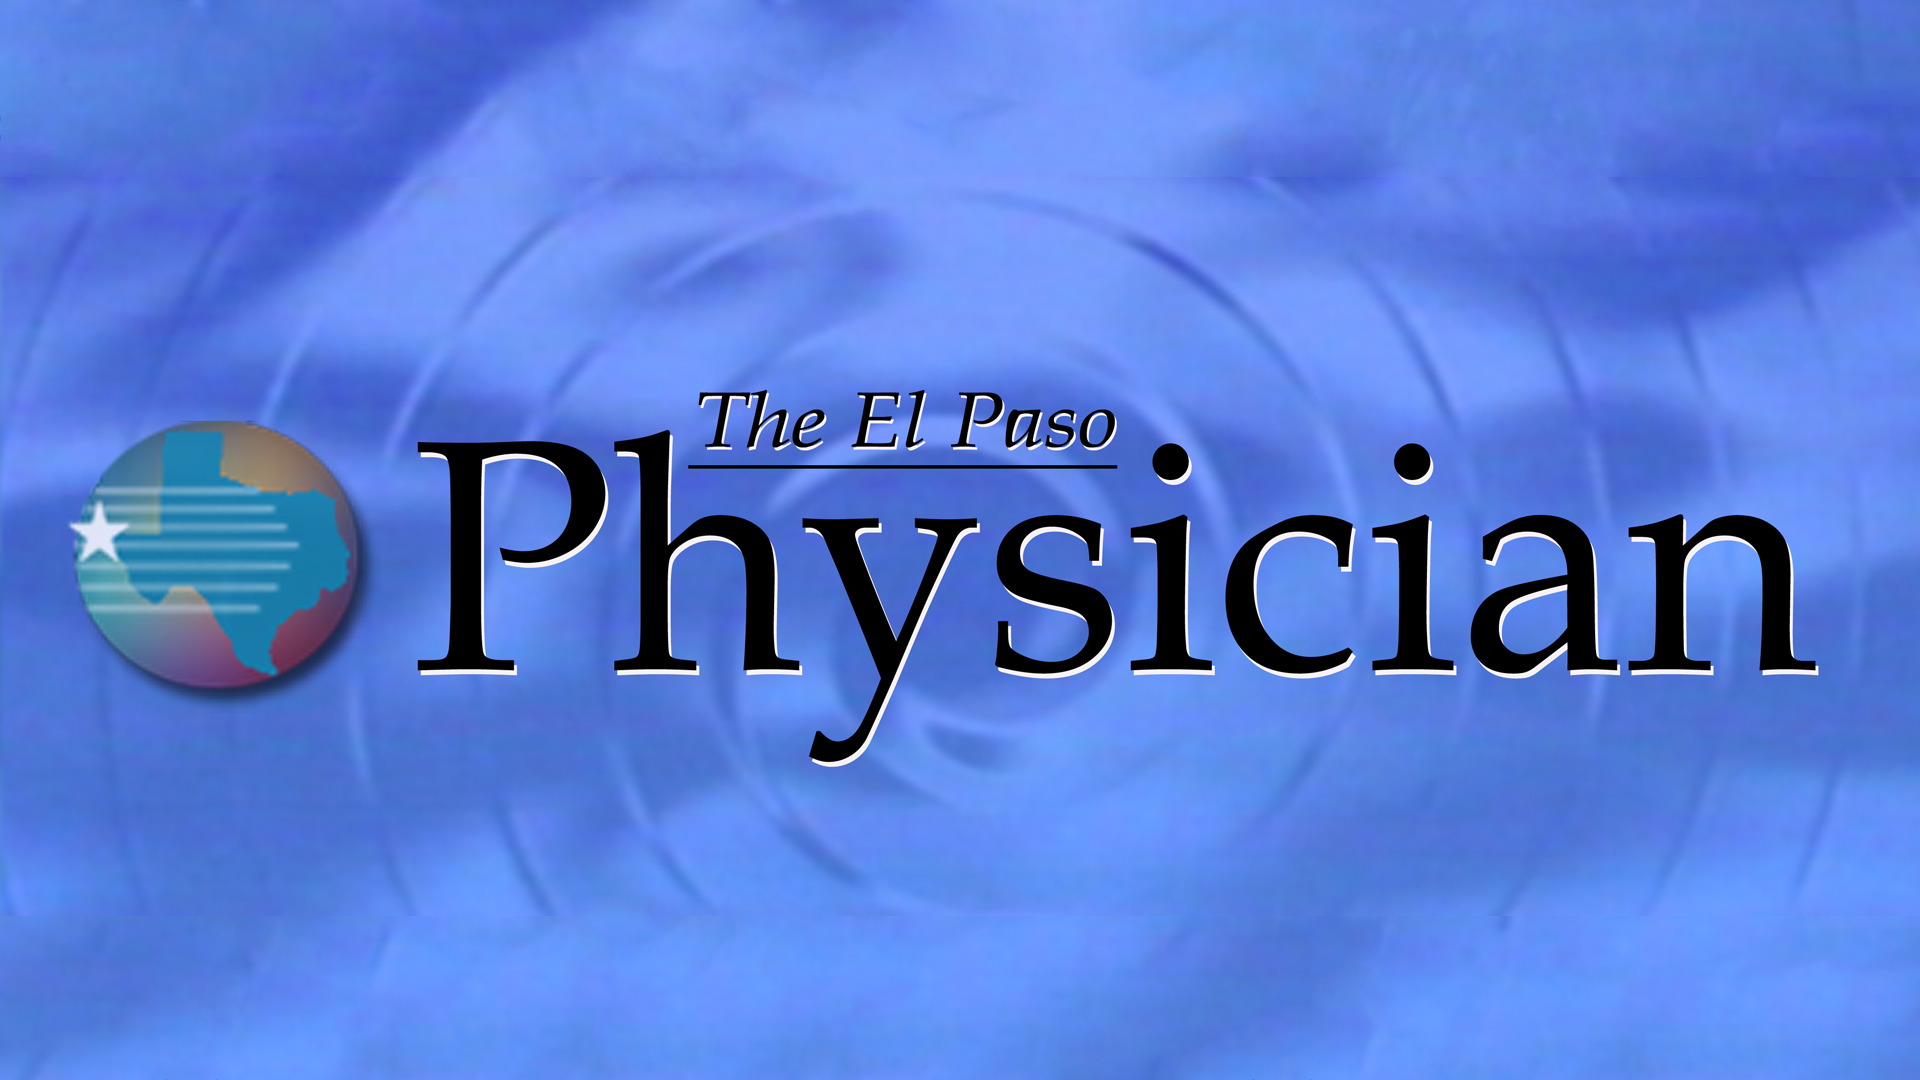 El Paso Physician - Treating Venous Disease :  PAD, Varicose Veins and more